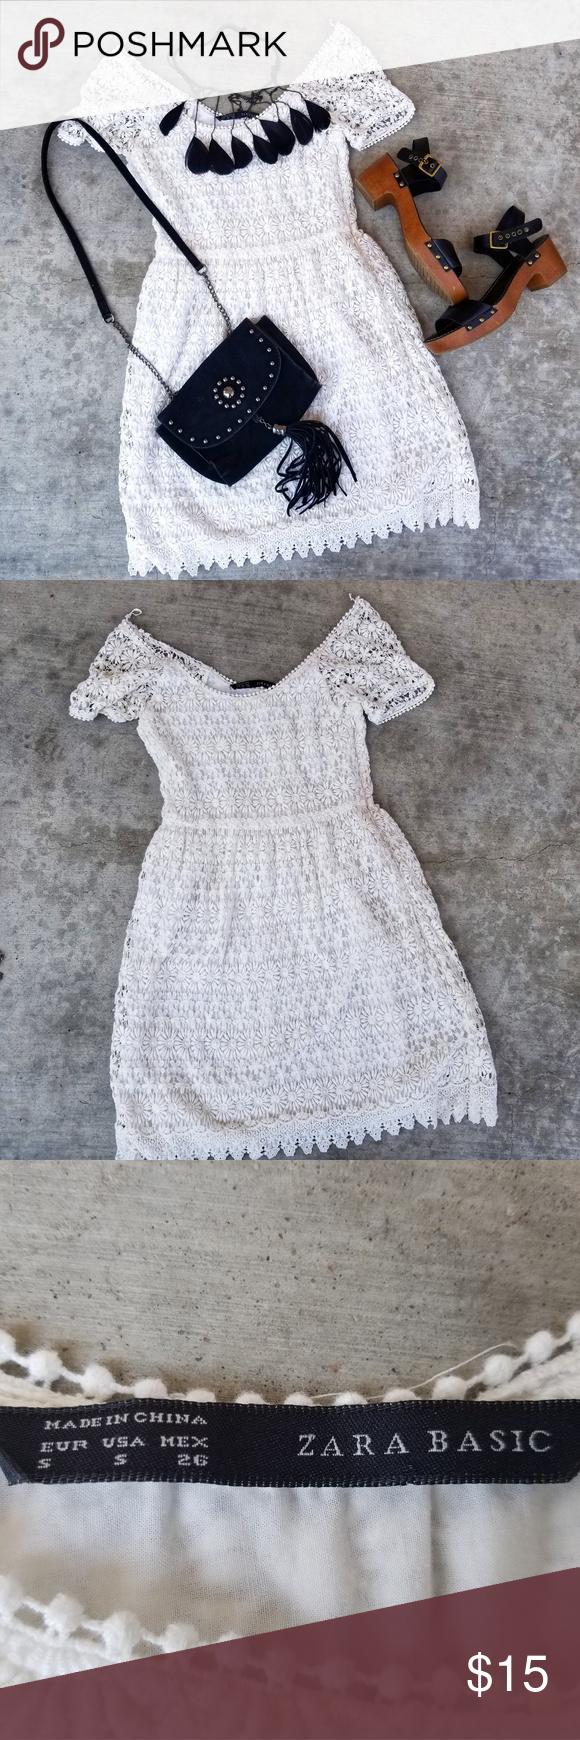 White lace dress zara  Zara lace dress  My Posh Picks  Pinterest  Lace Dress Dresses